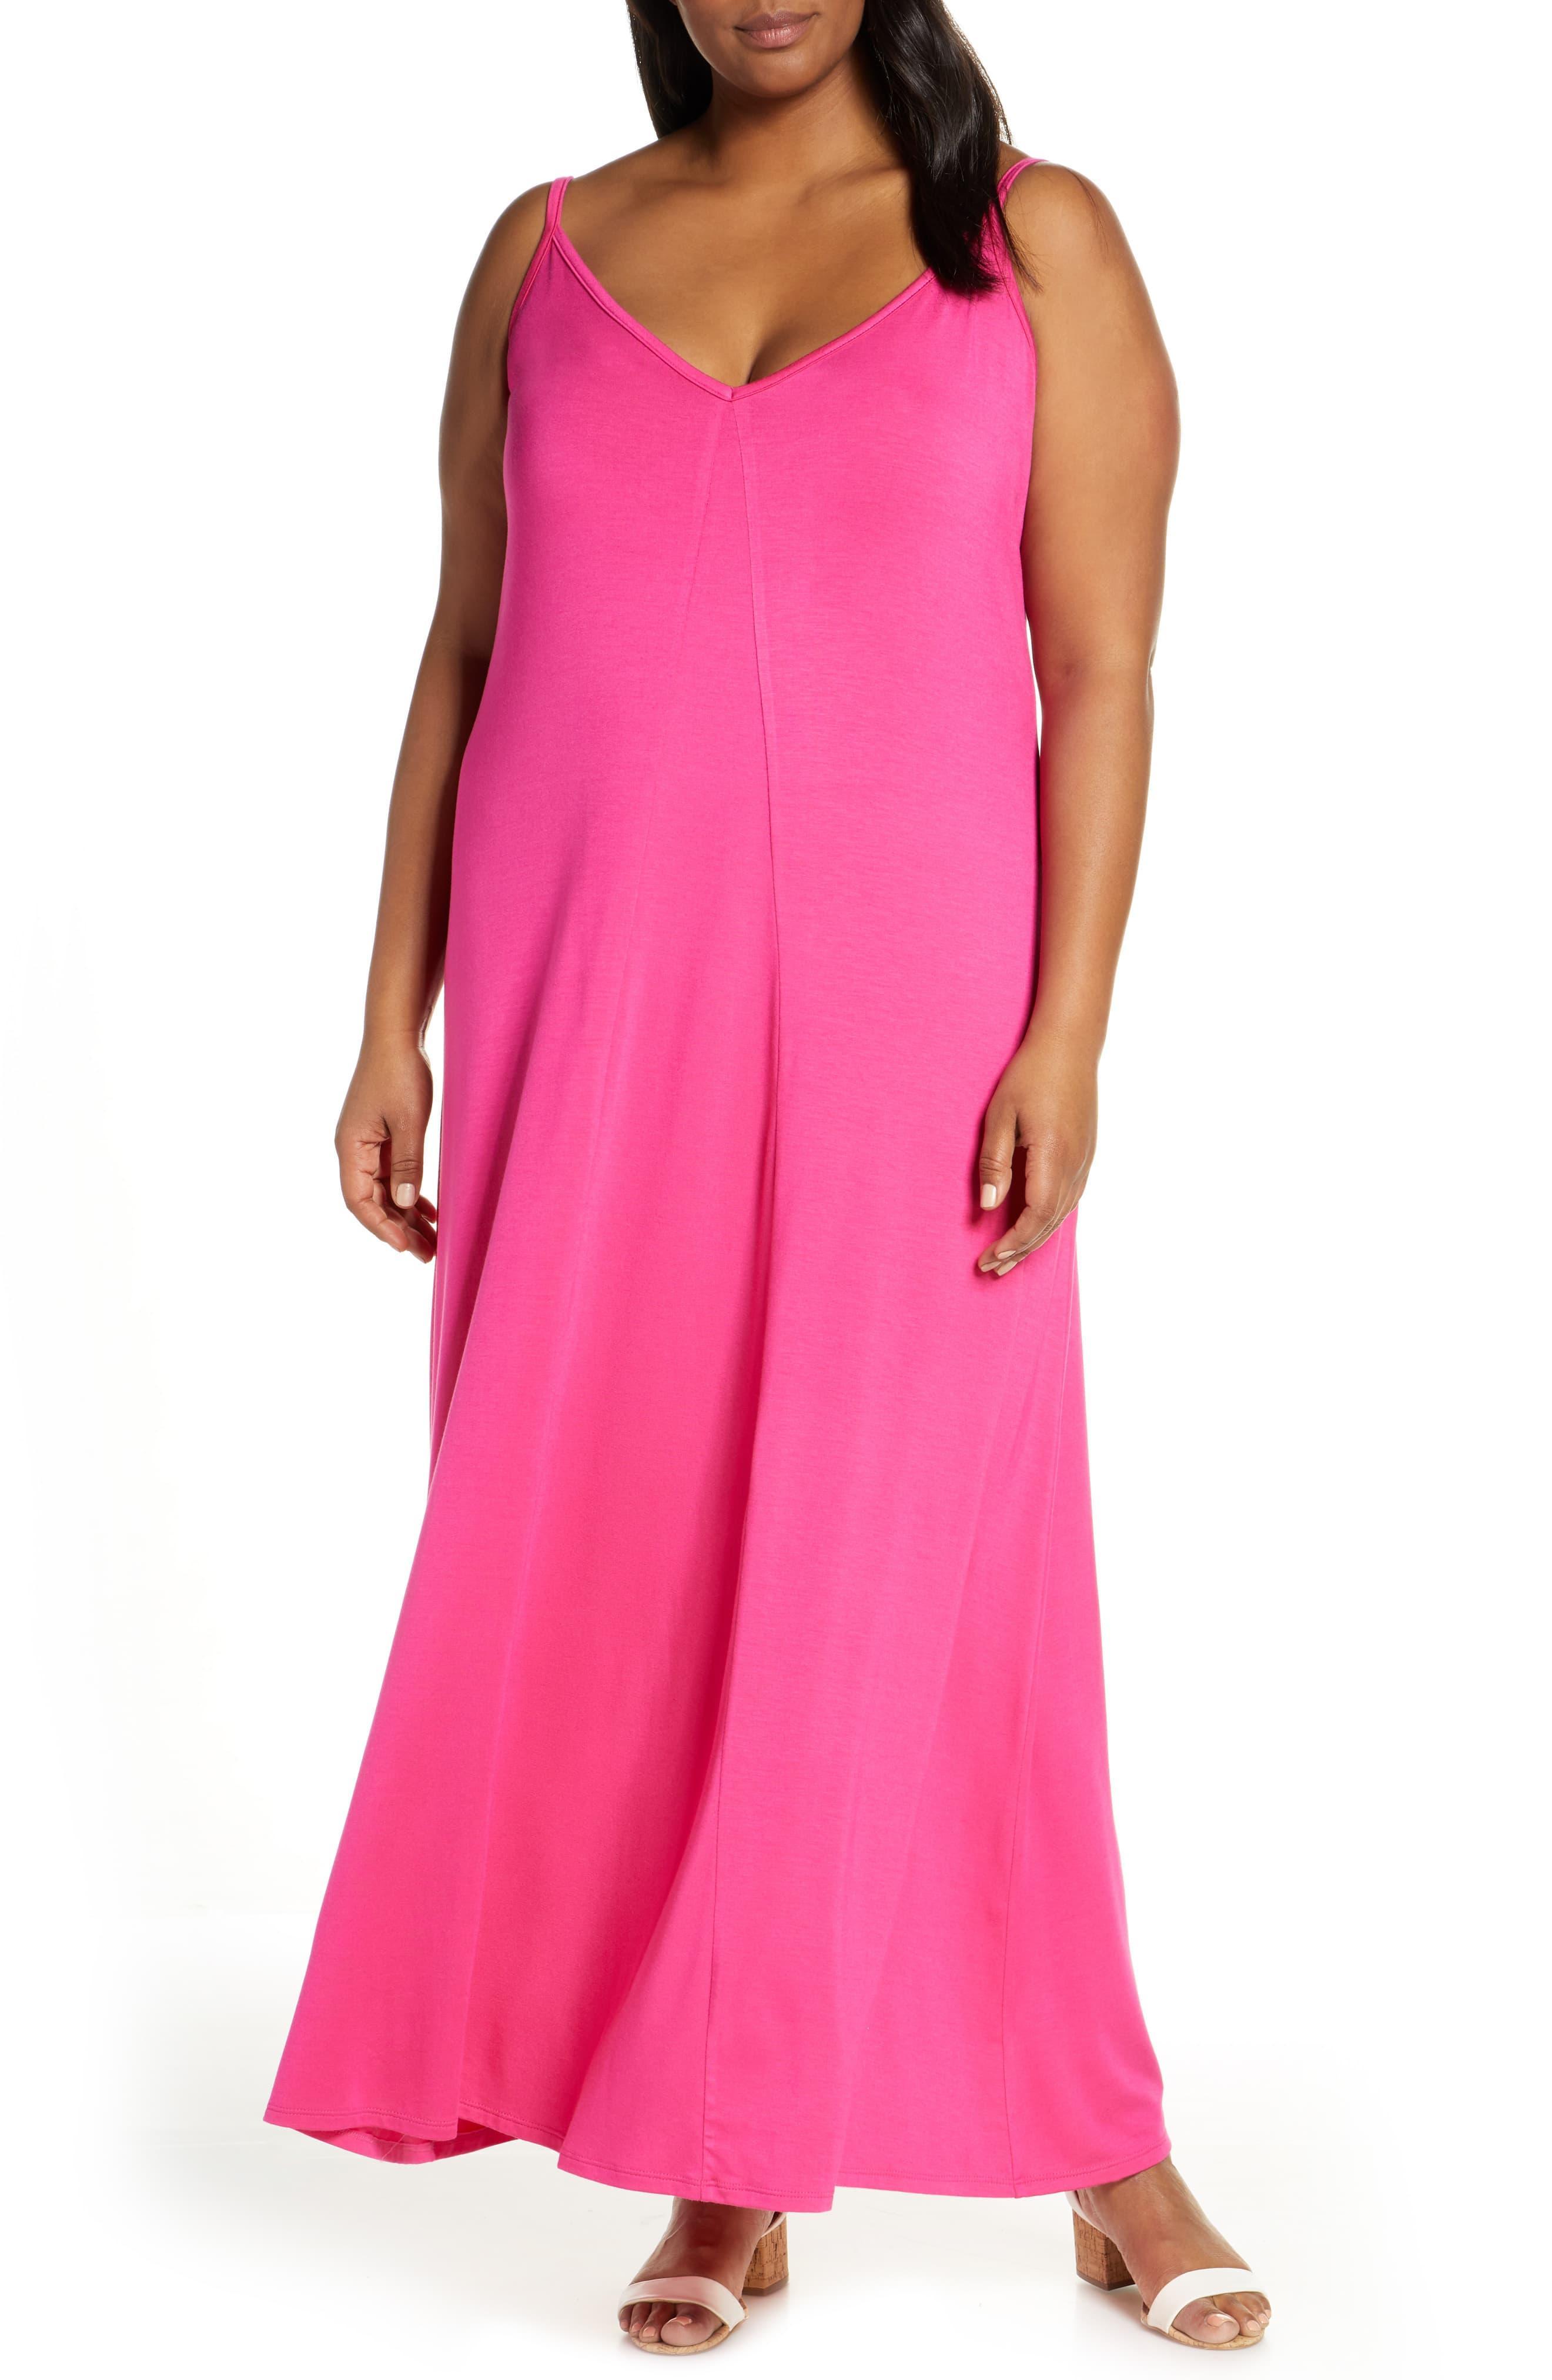 d7b38fb23b1 Lyst - Gibson X Living In Yellow Hazel Casual Knit Maxi Dress in Pink